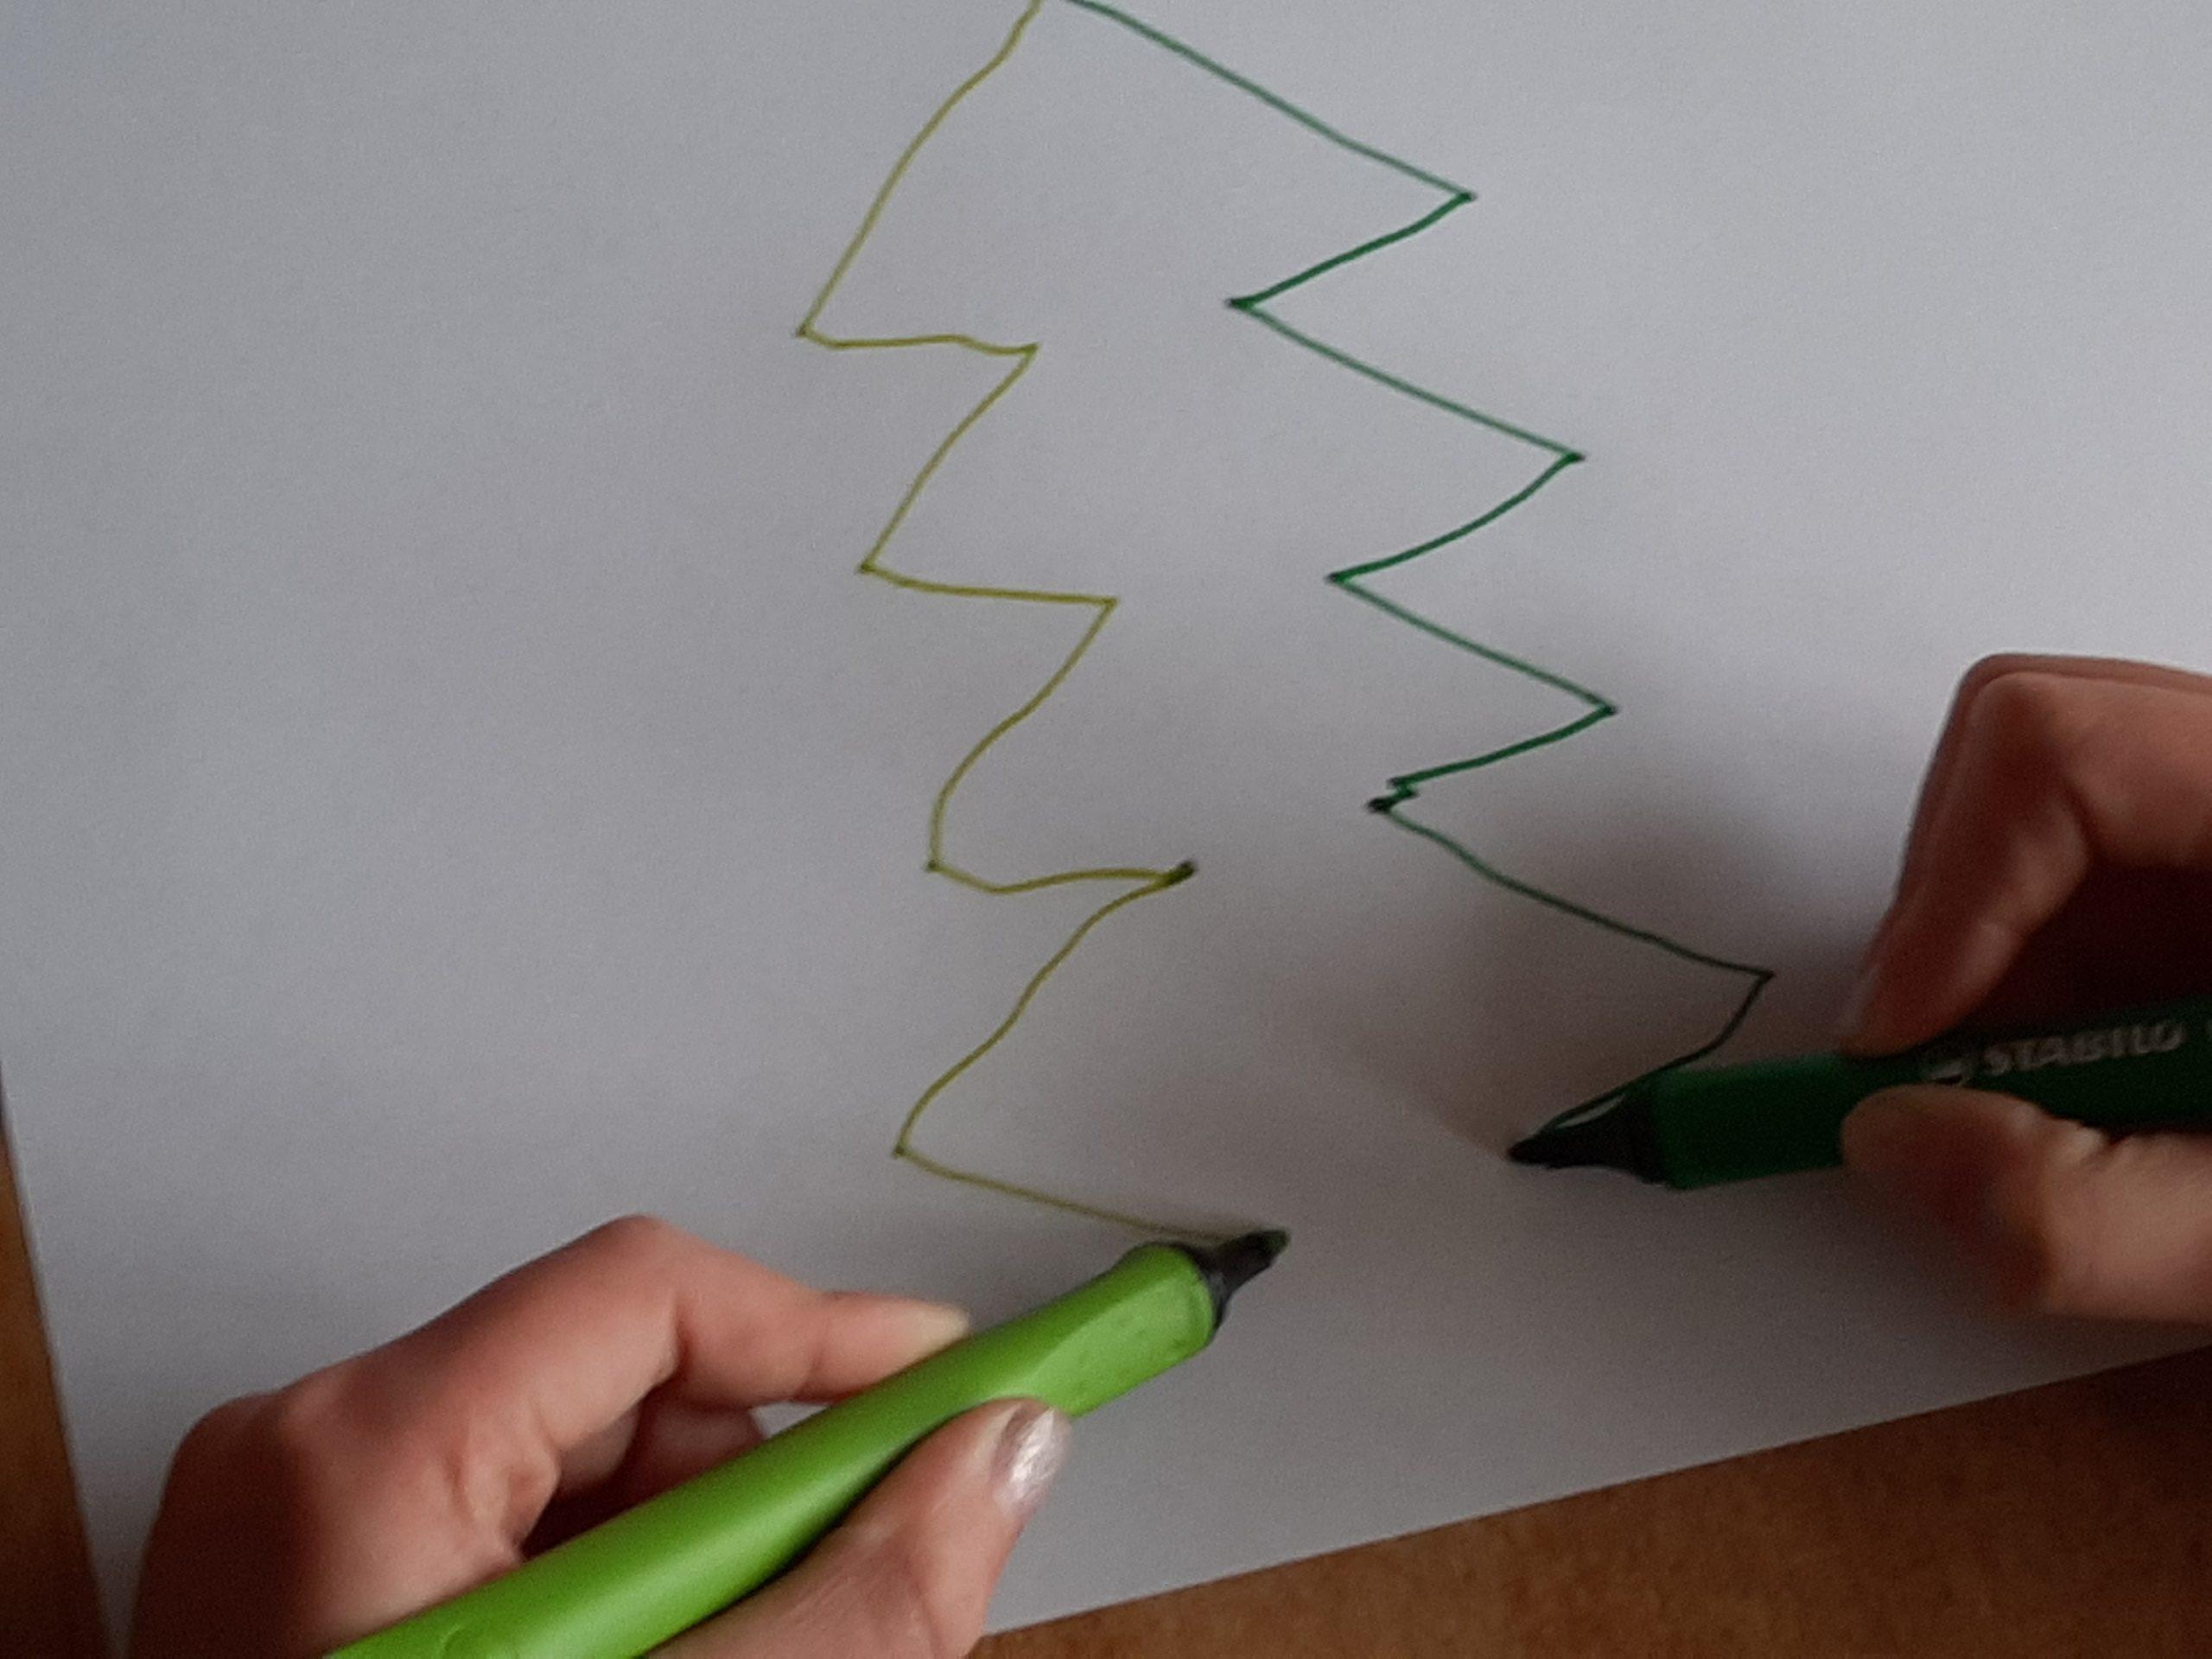 beweeg je mee kalender, tweehandig tekenen kerstboom